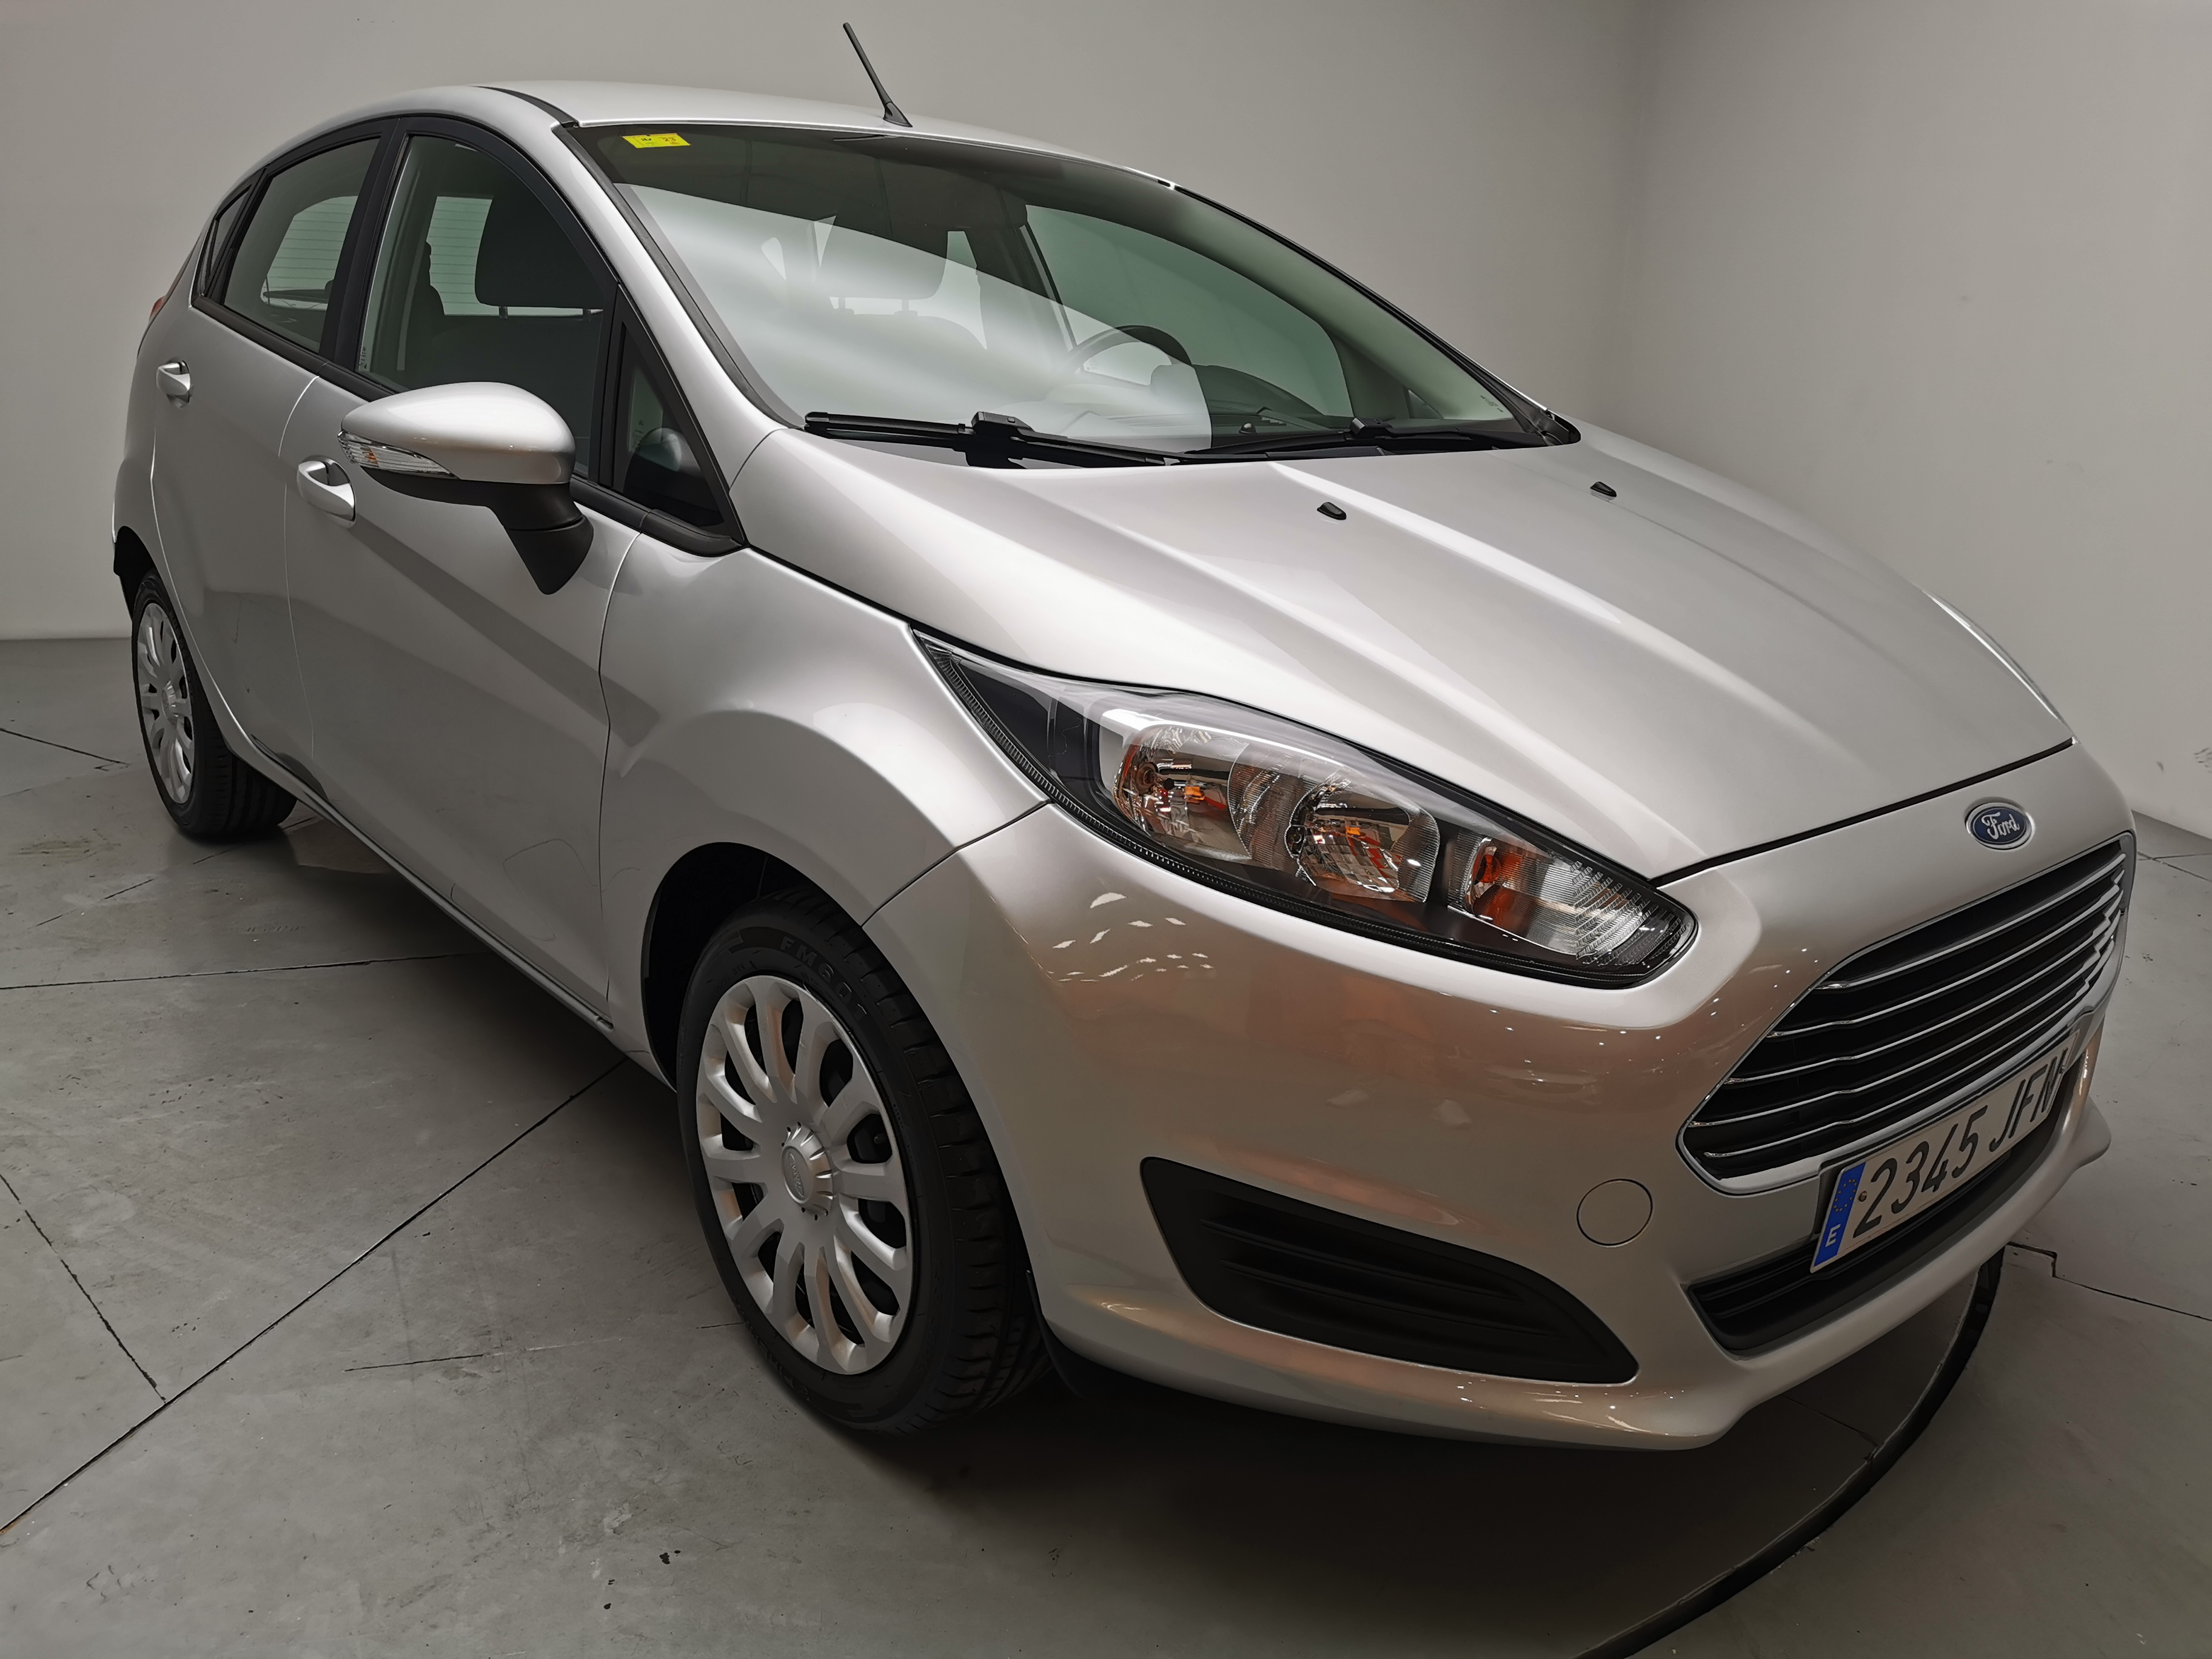 Ford Fiesta ocasión segunda mano 2015 Gasolina por 7.800€ en Málaga